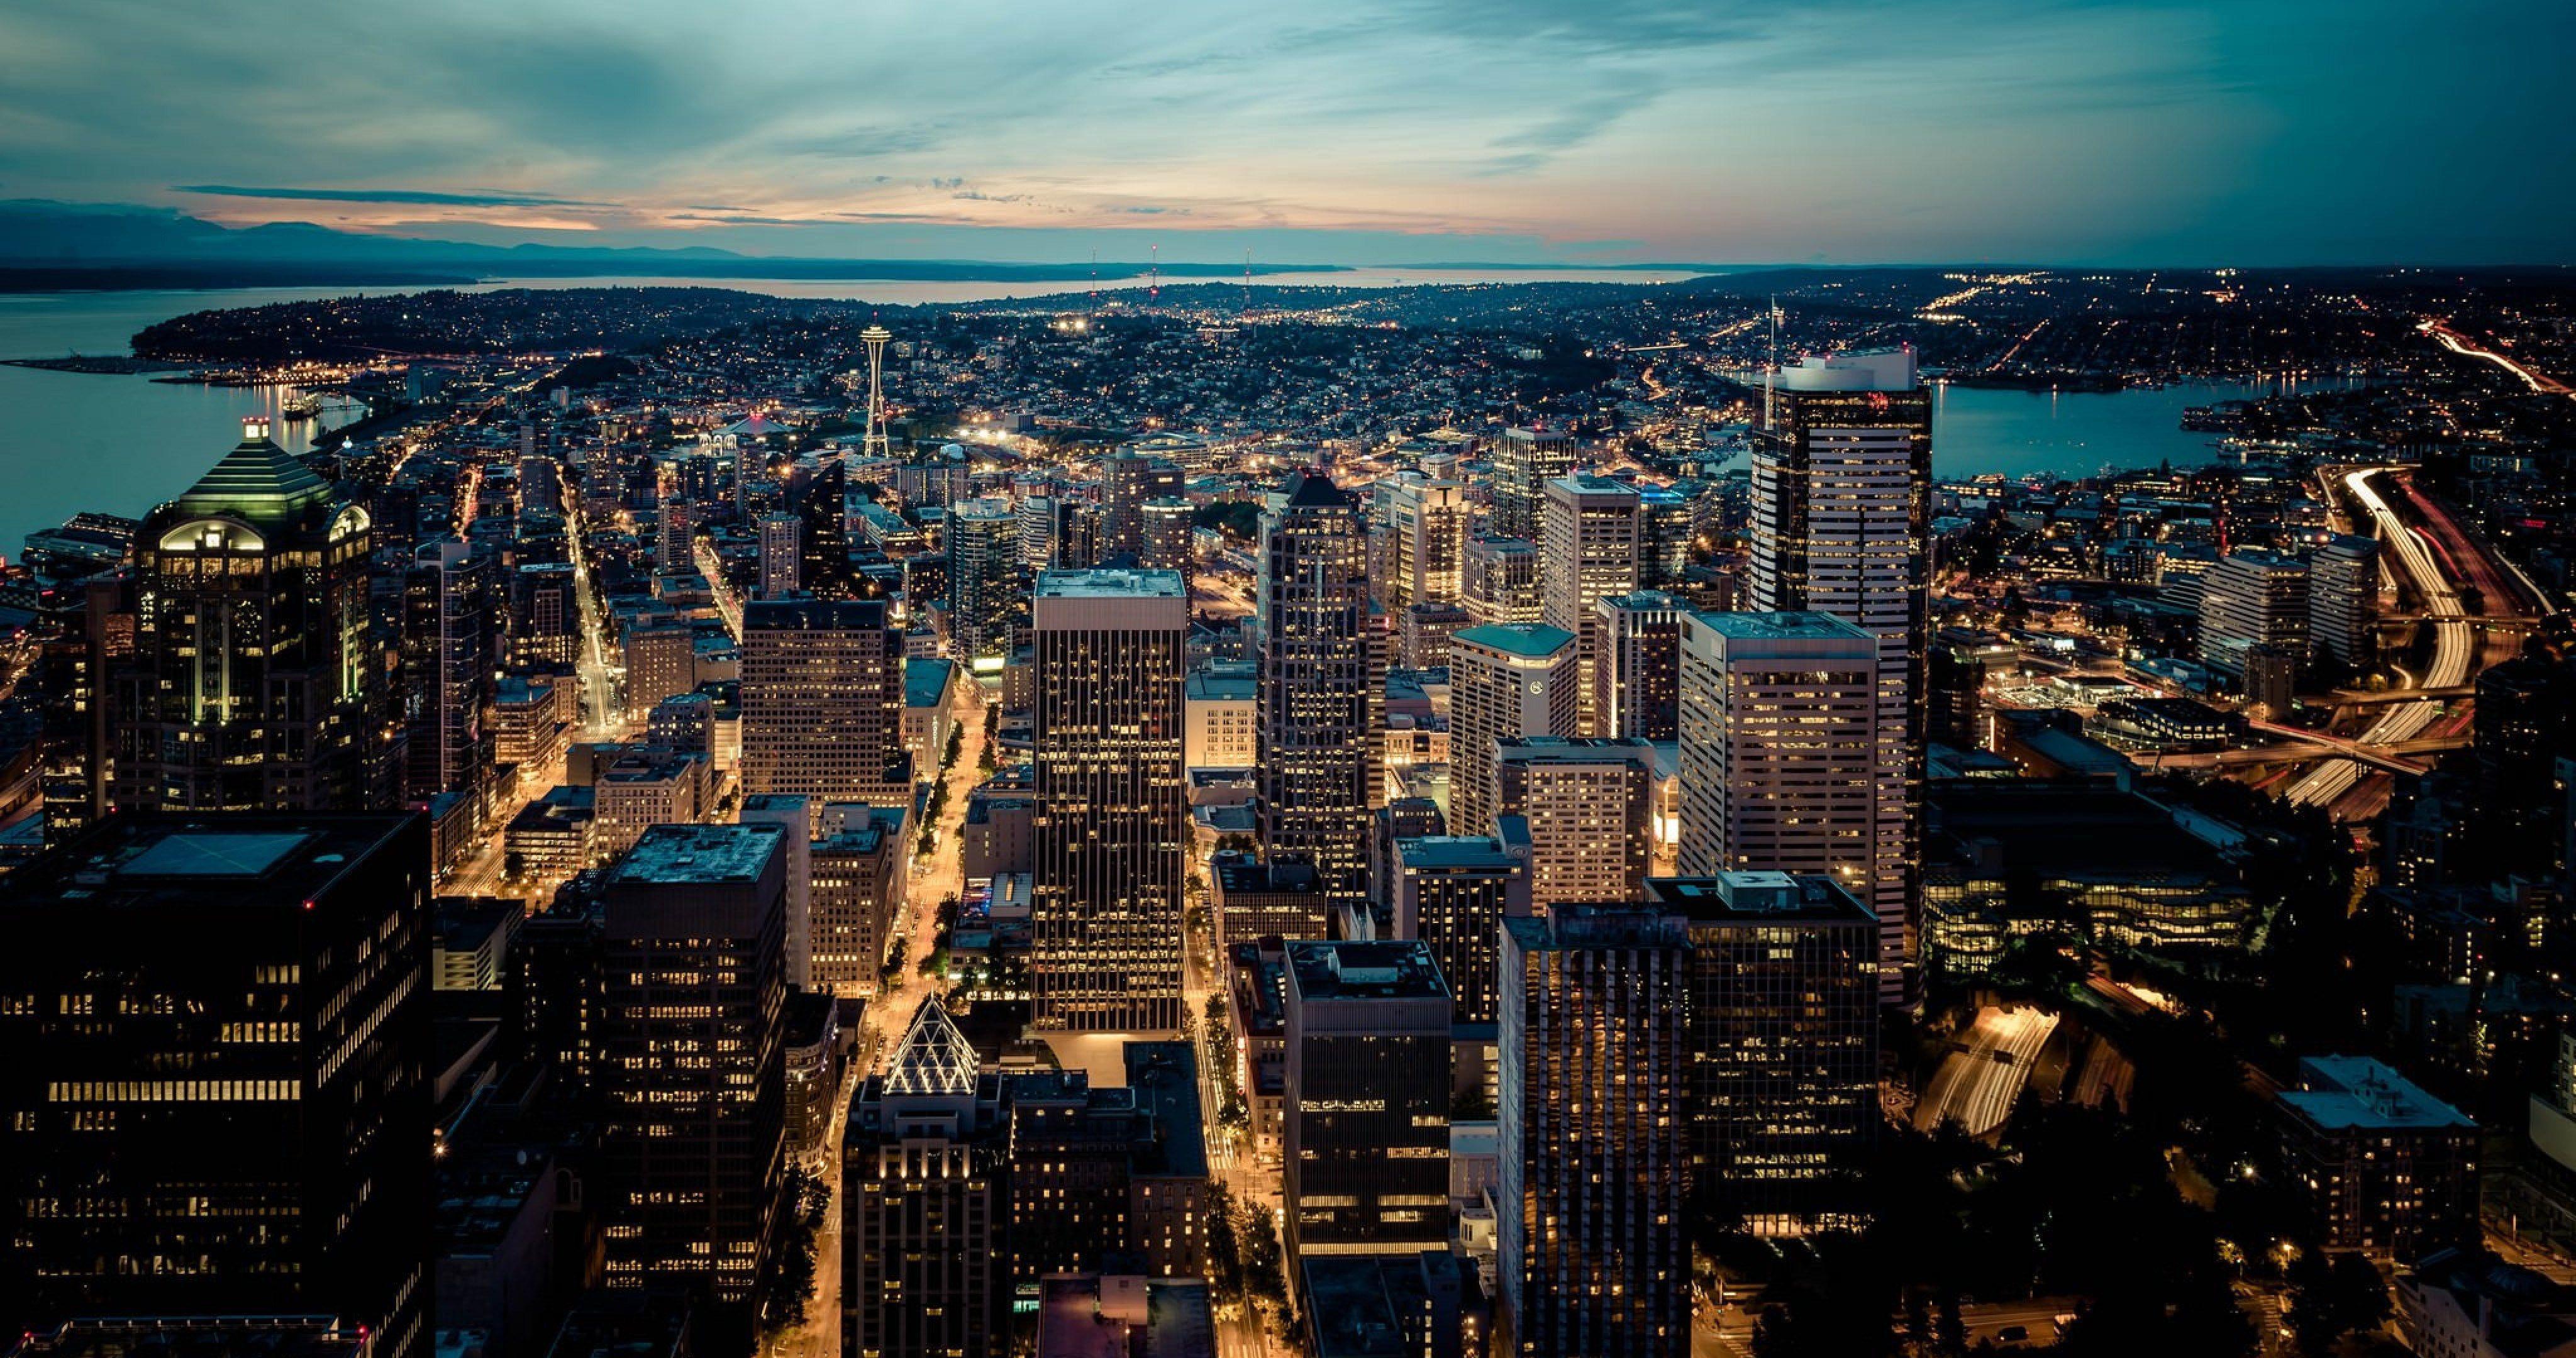 Seattle Washington In Fall City Night Wallpaper 4k Urban Wallpapers Top Free 4k Urban Backgrounds